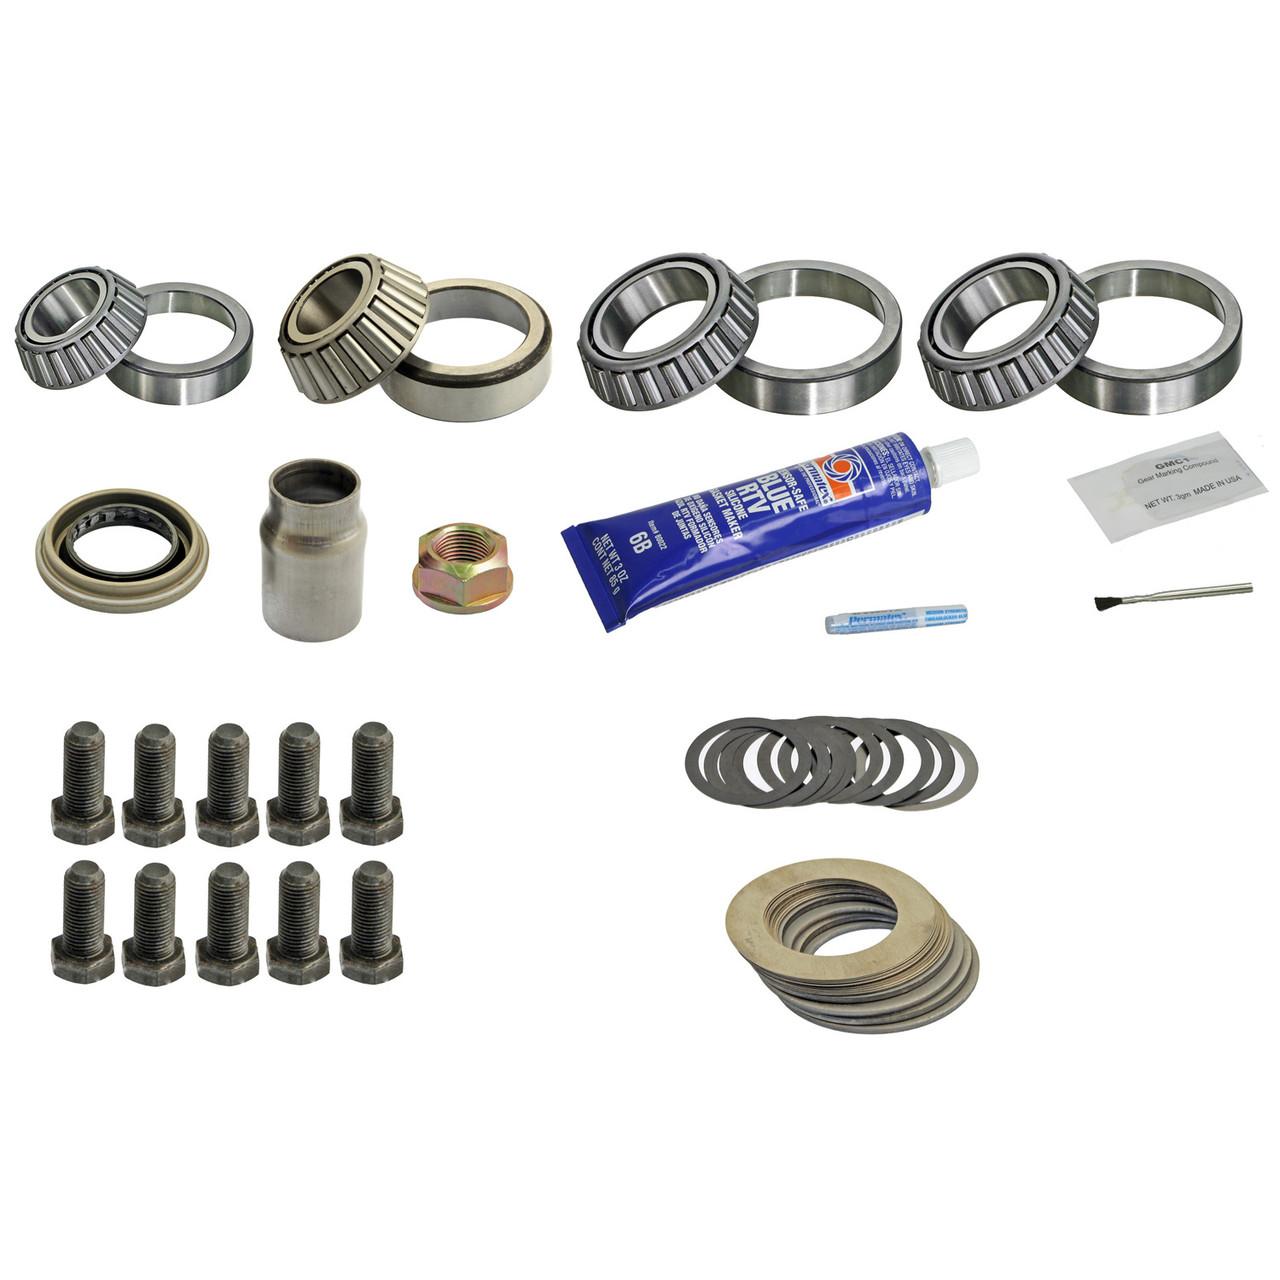 DRK339AMK Dana 44 Rear Timken Master Differential Bearing Kit